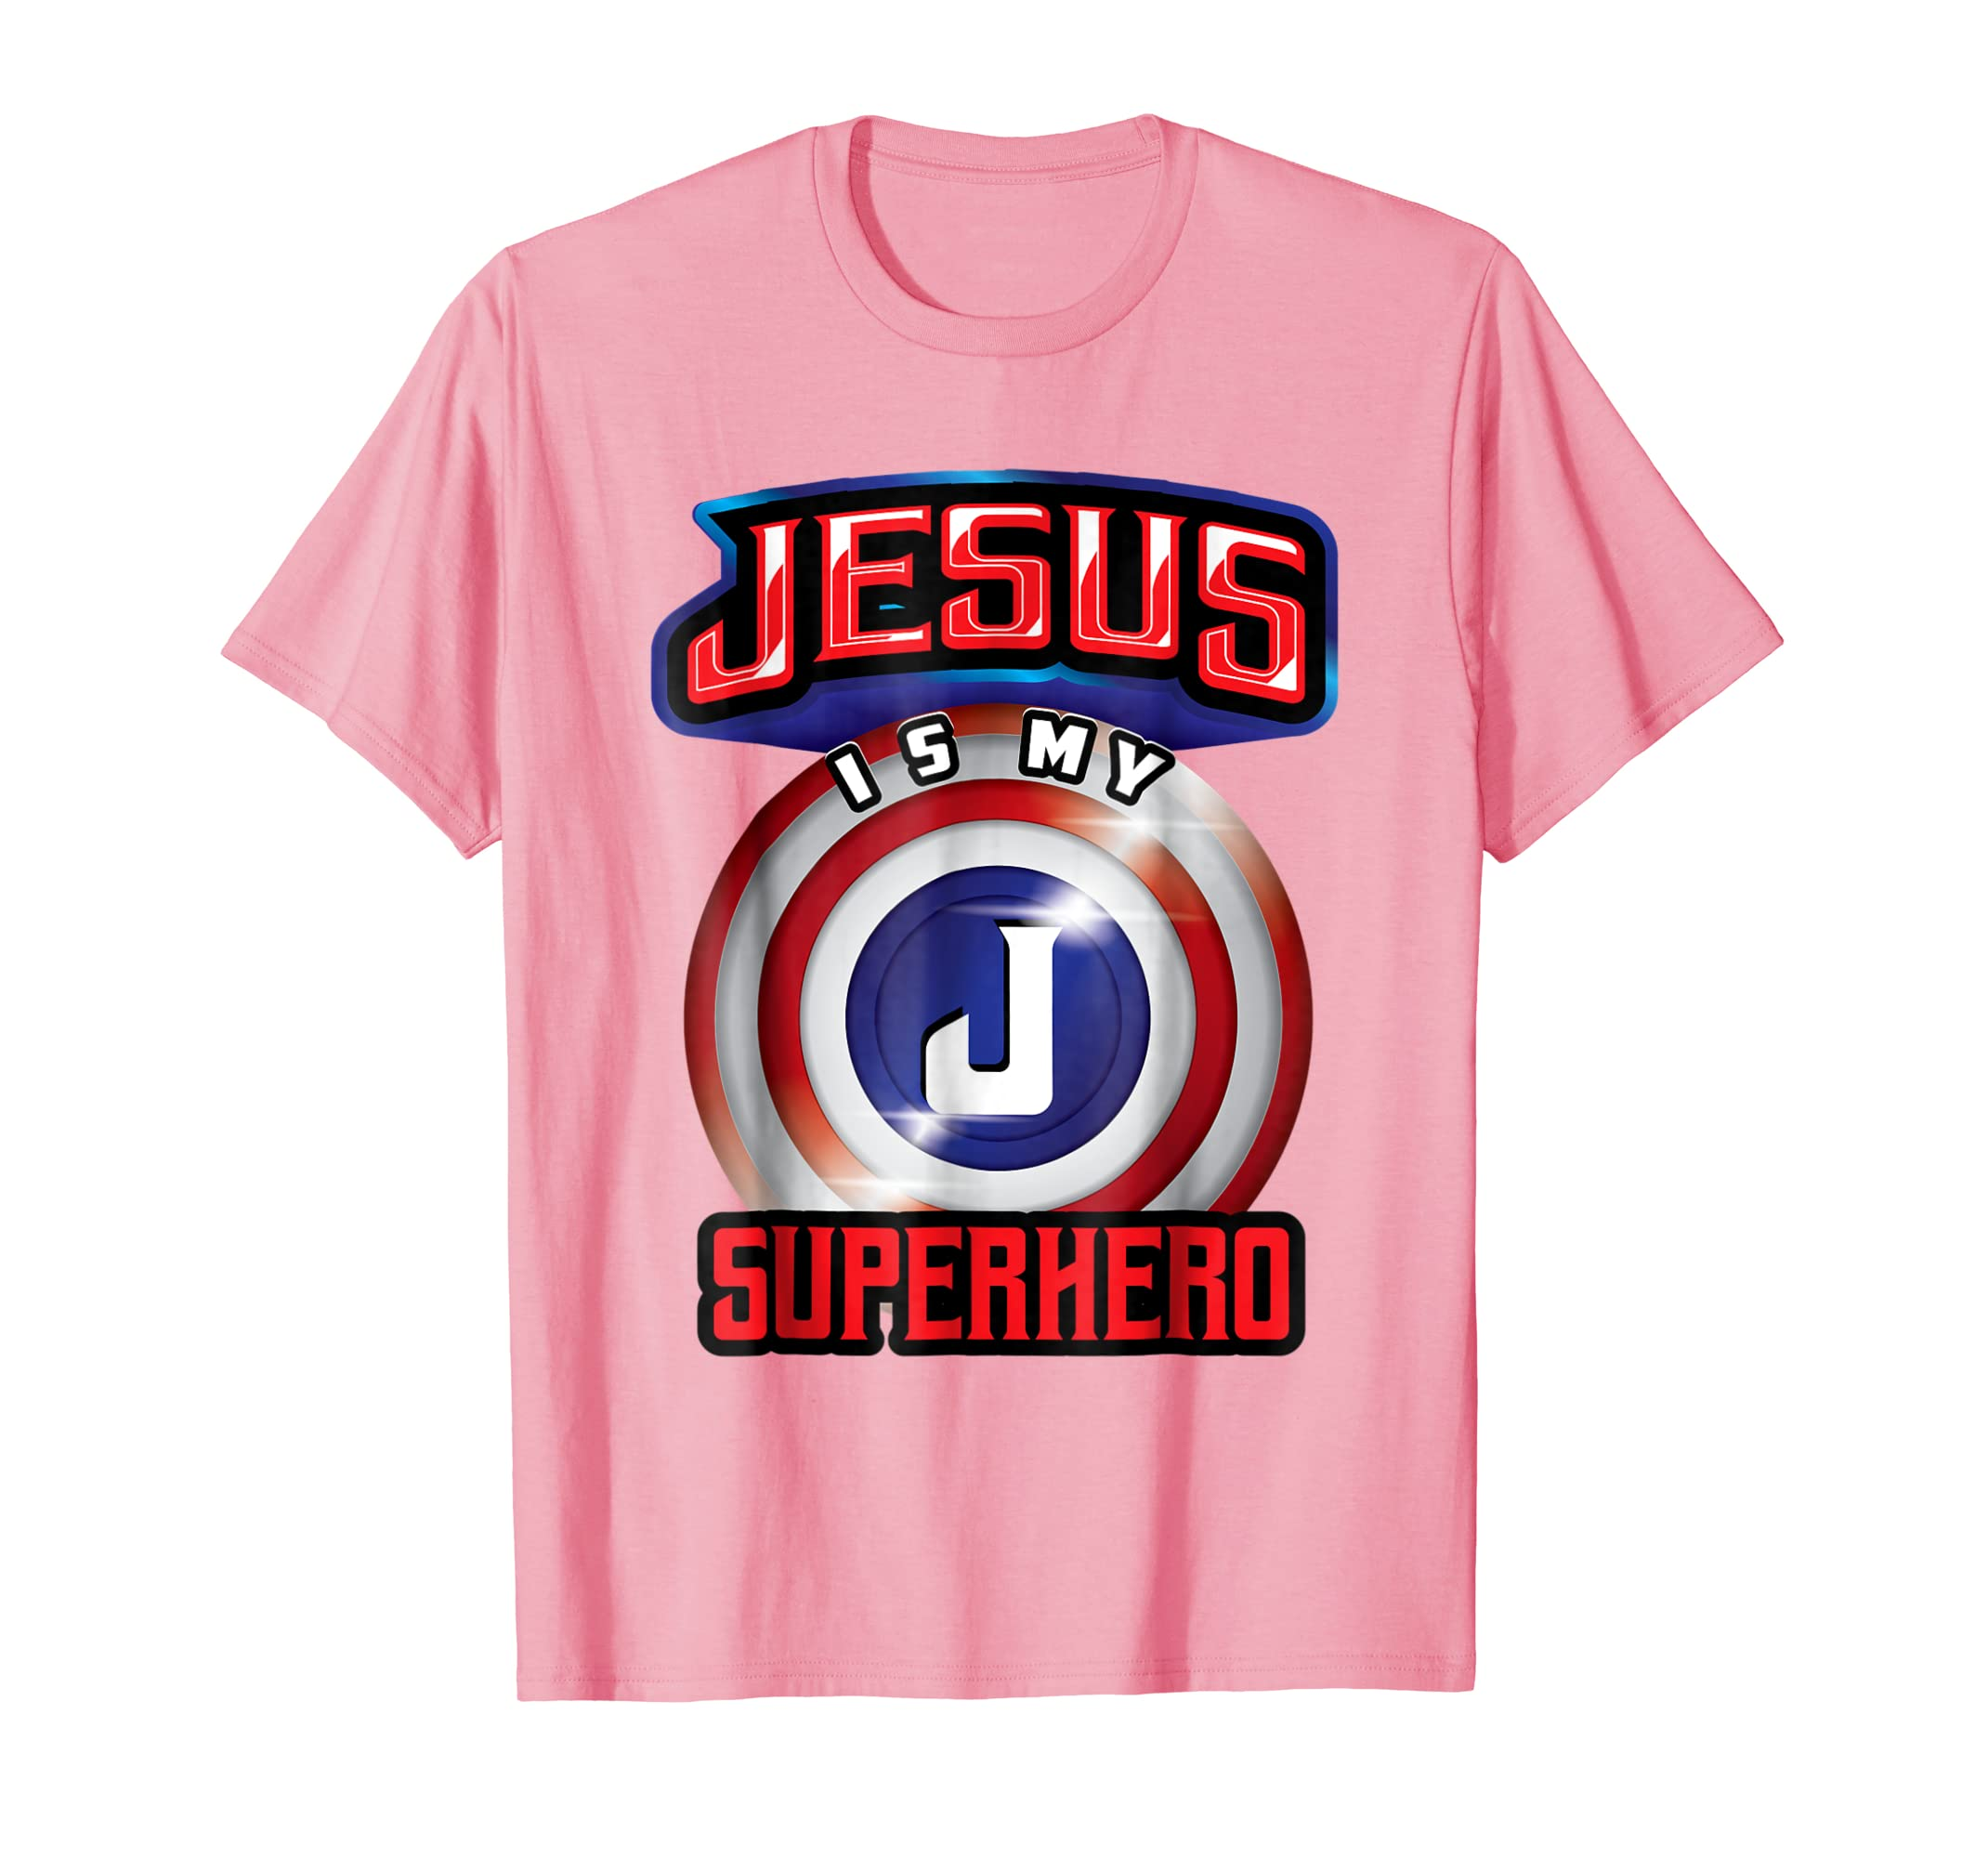 Amazon.com: Jesus Is My Superhero Shirt   Cute Powerful Christian ...